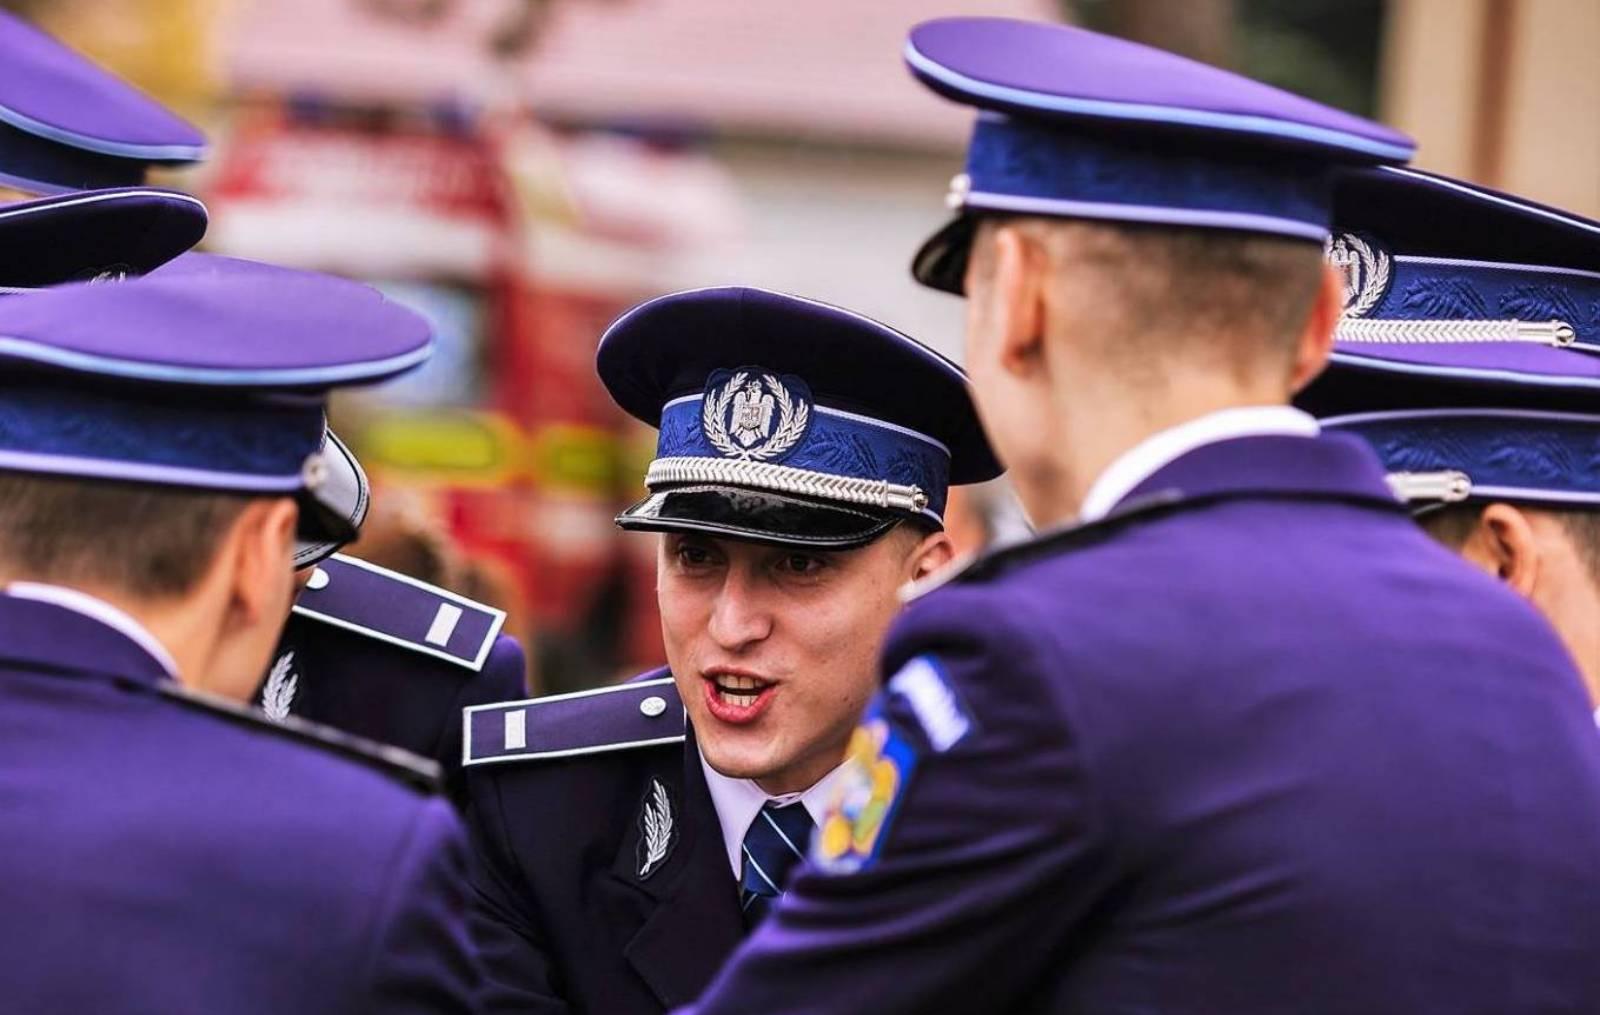 alerta Politia Romana phishing